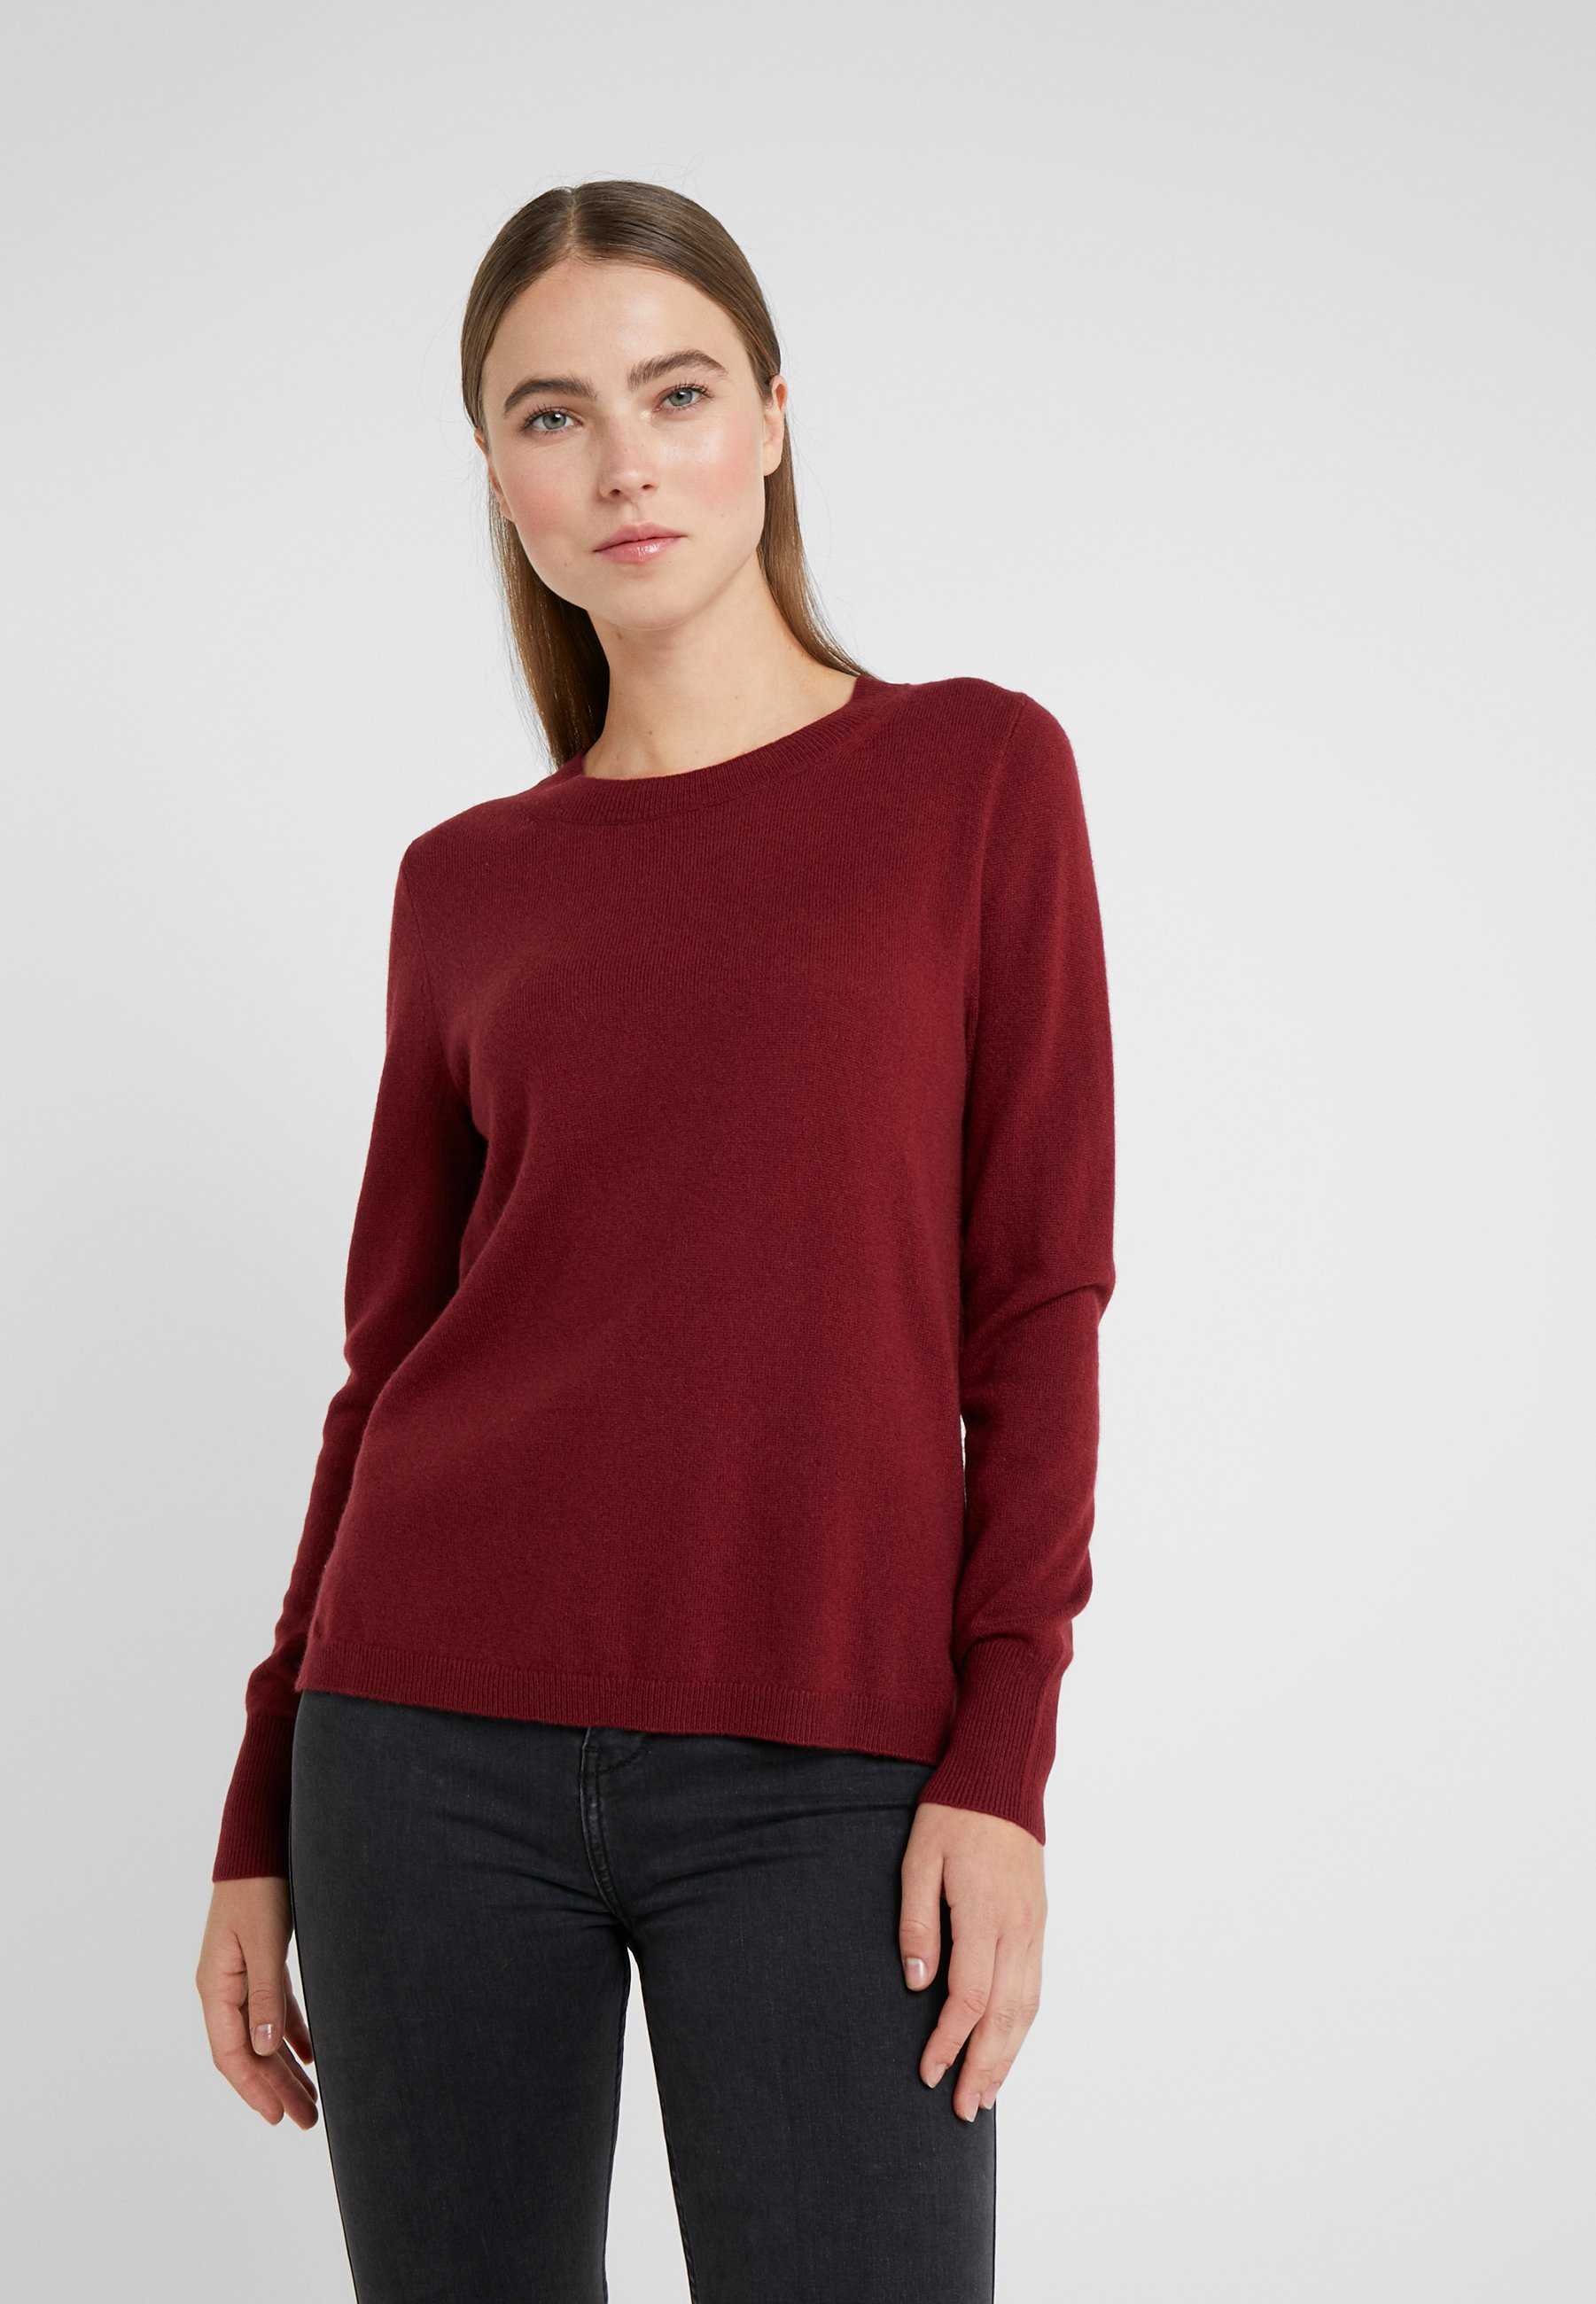 J.CREW LAYLA CREW - Strickpullover - burgundy | Damenbekleidung billig